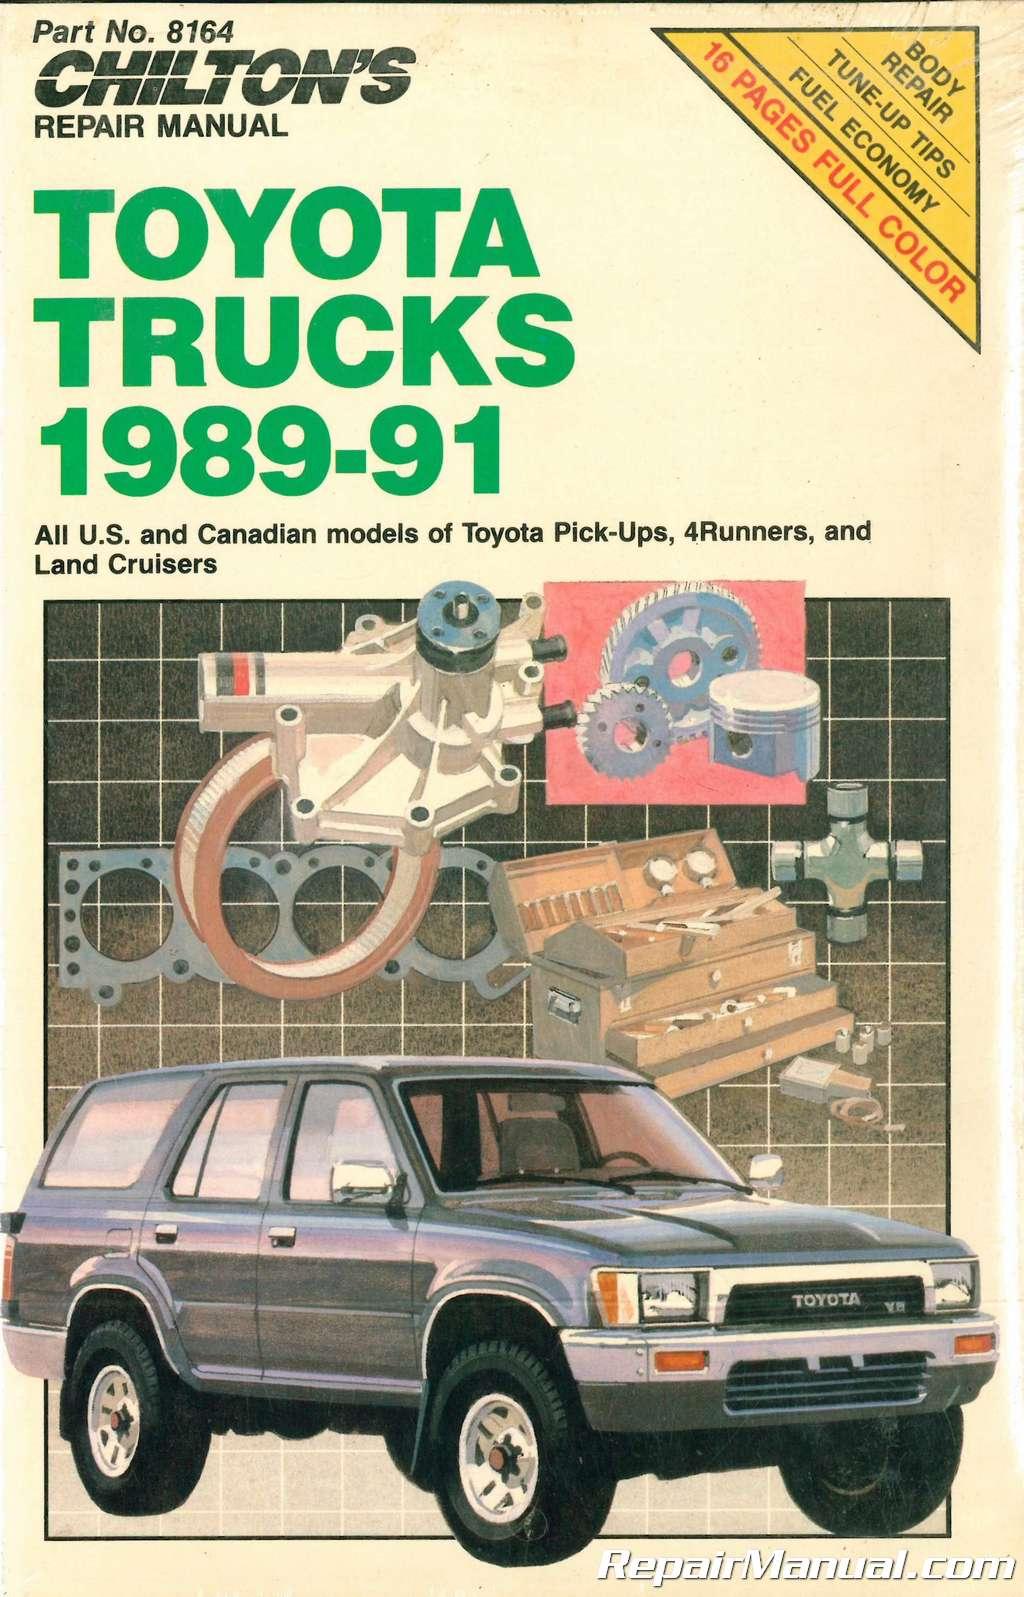 Chilton Toyota Trucks 1989 – 1991 Repair Manual